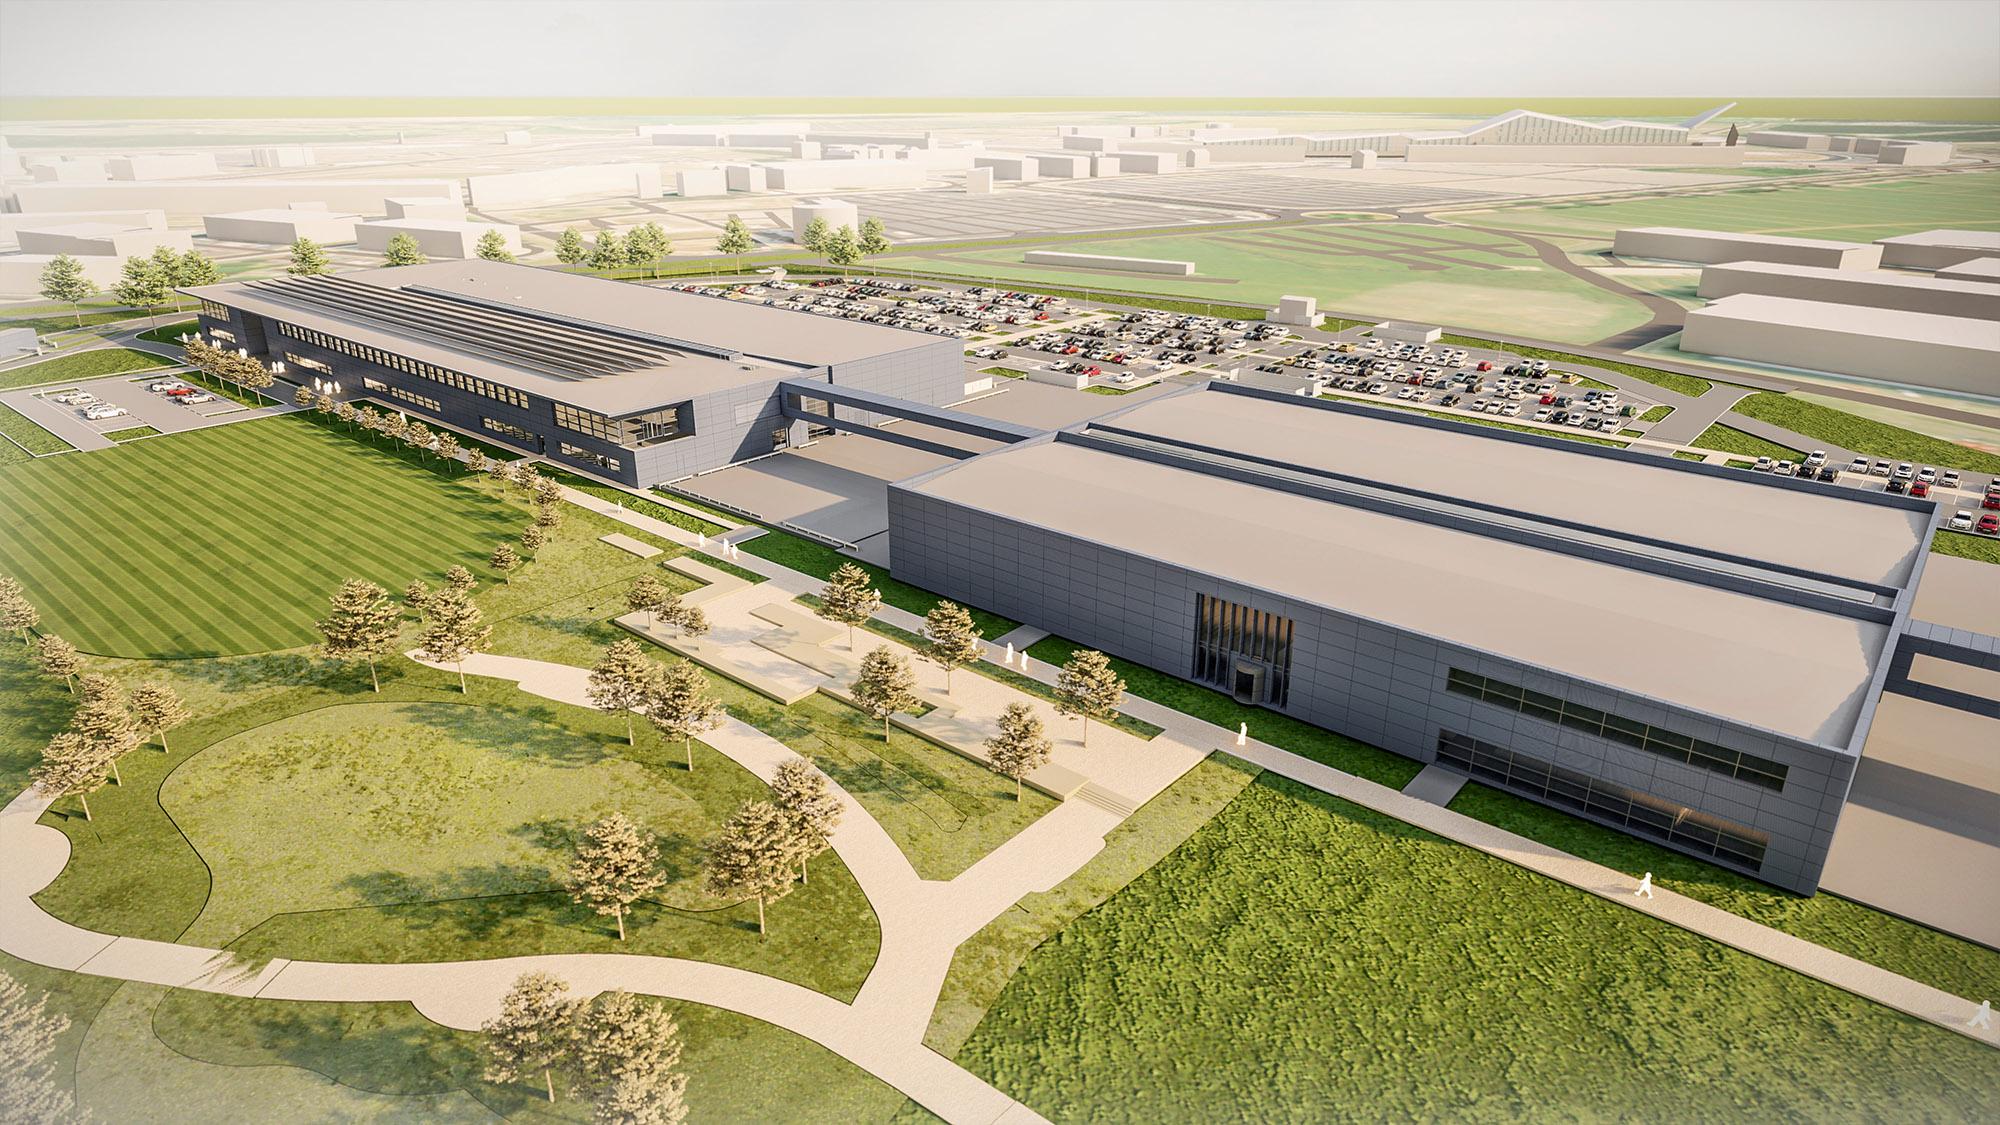 Aston Martin F1 factory digital image